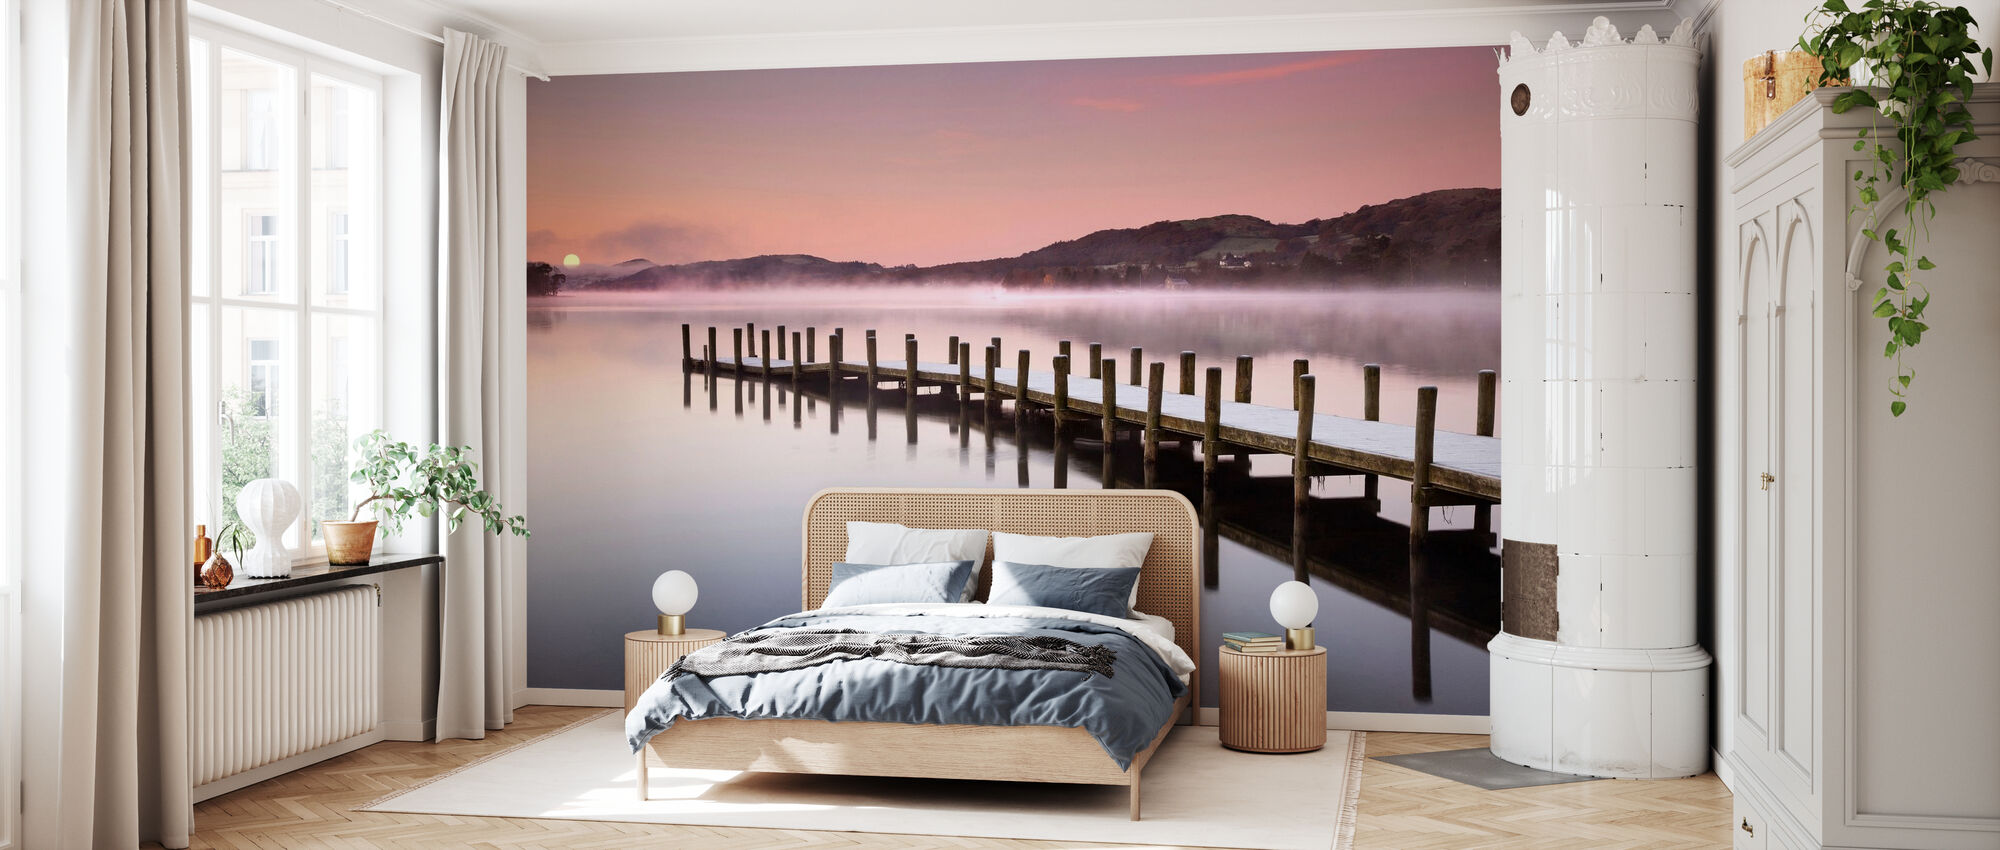 Landing Jetty on Coniston Water - Wallpaper - Bedroom